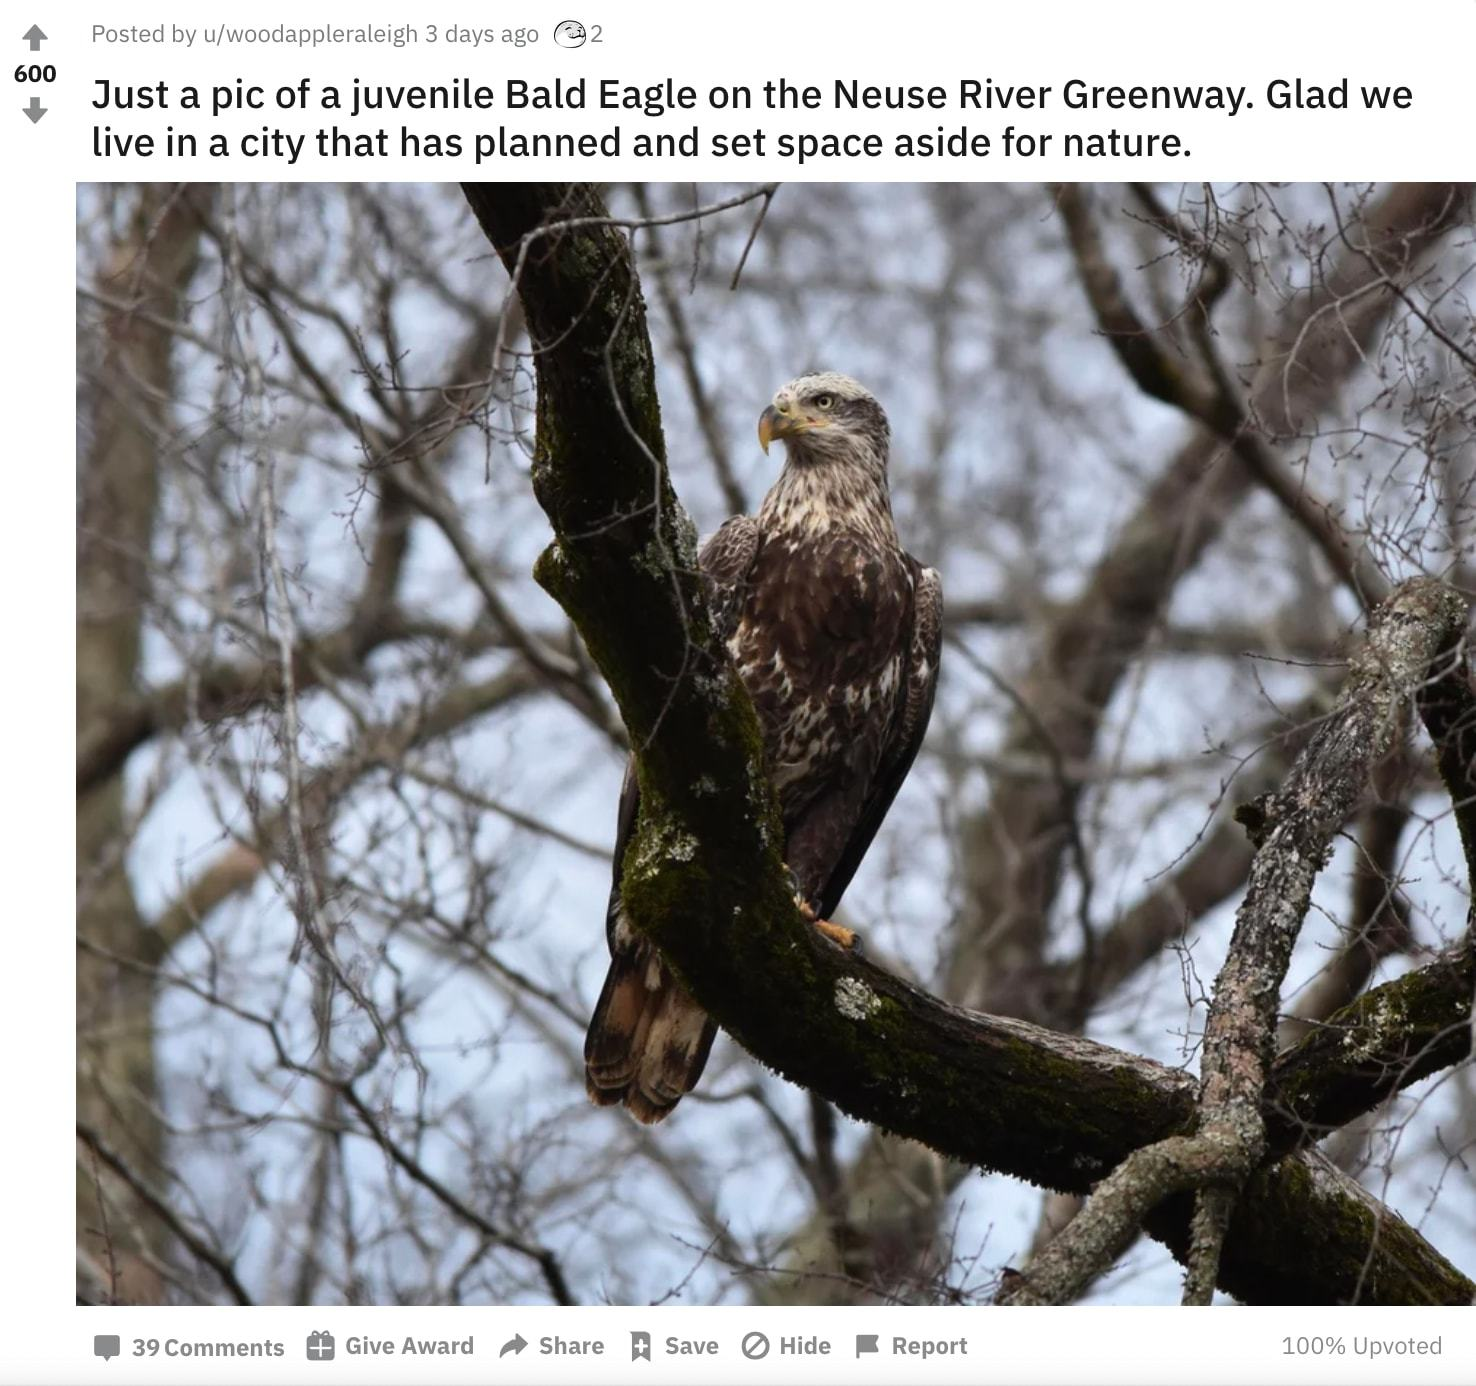 Juvenile bald eagle photo